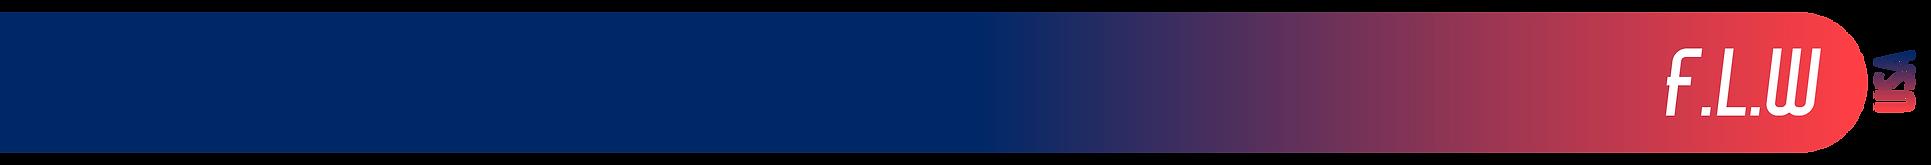 FLW Logos-05.png